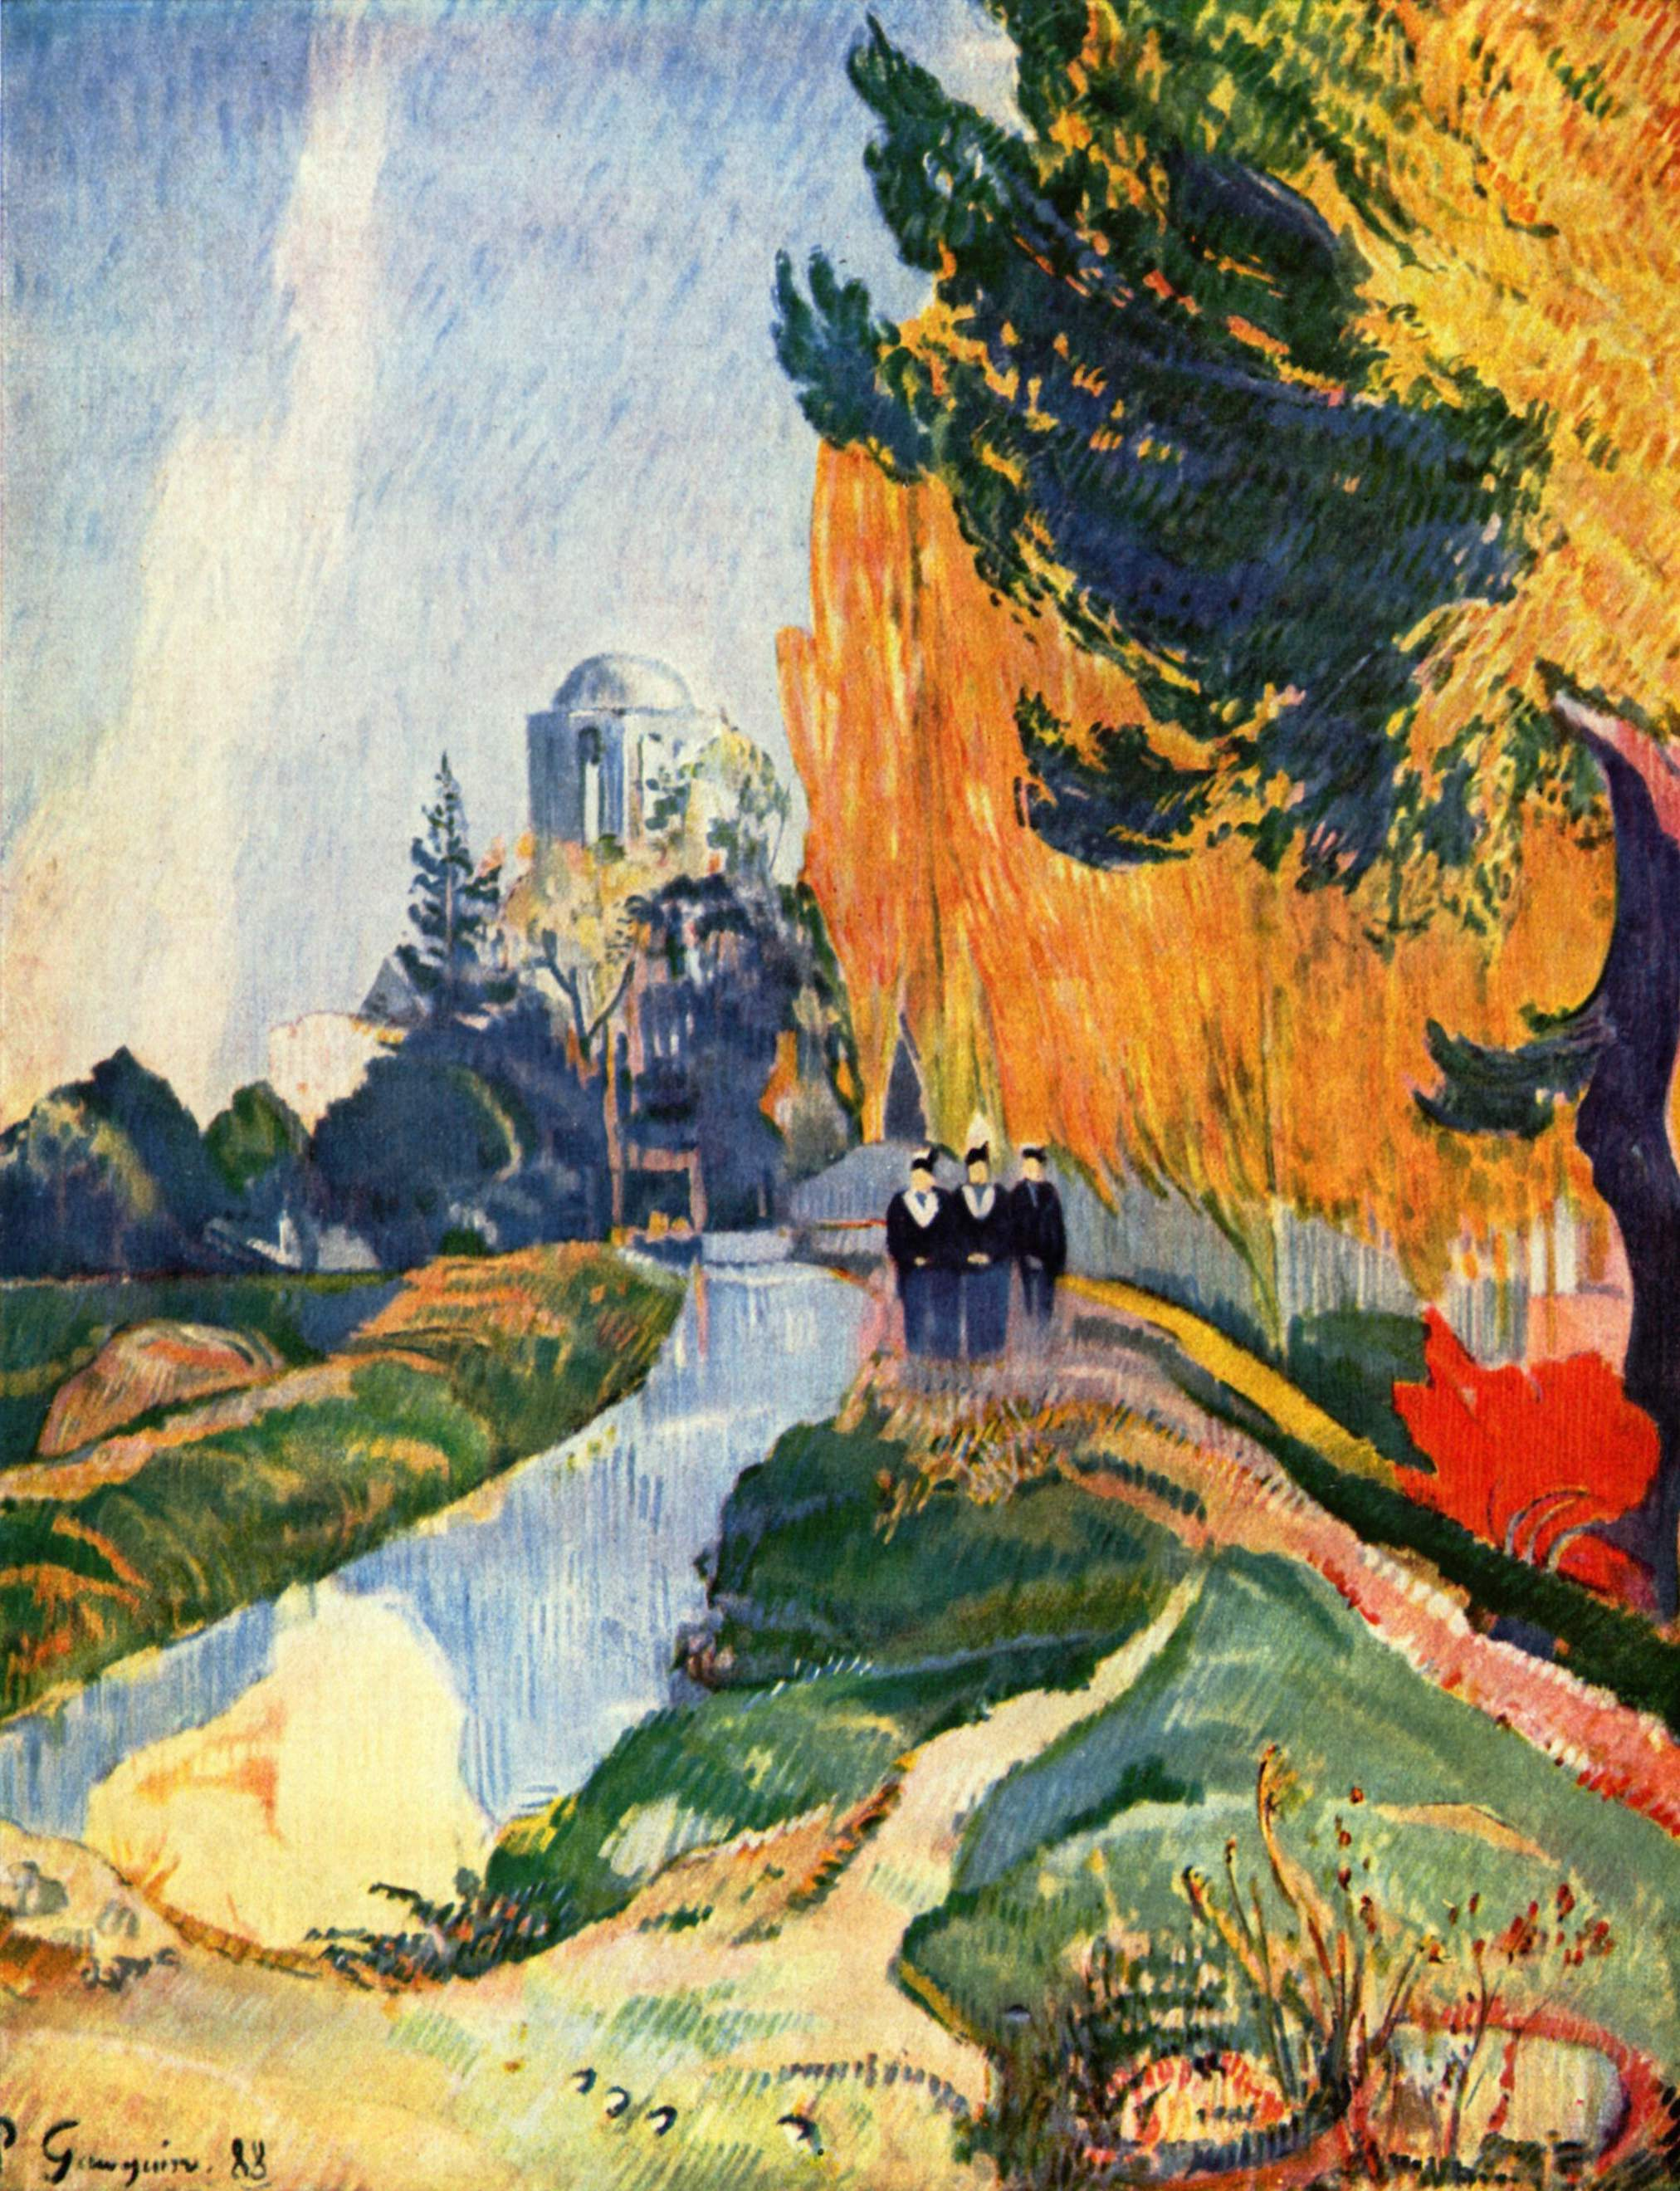 http://upload.wikimedia.org/wikipedia/commons/1/12/Paul_Gauguin_085.jpg